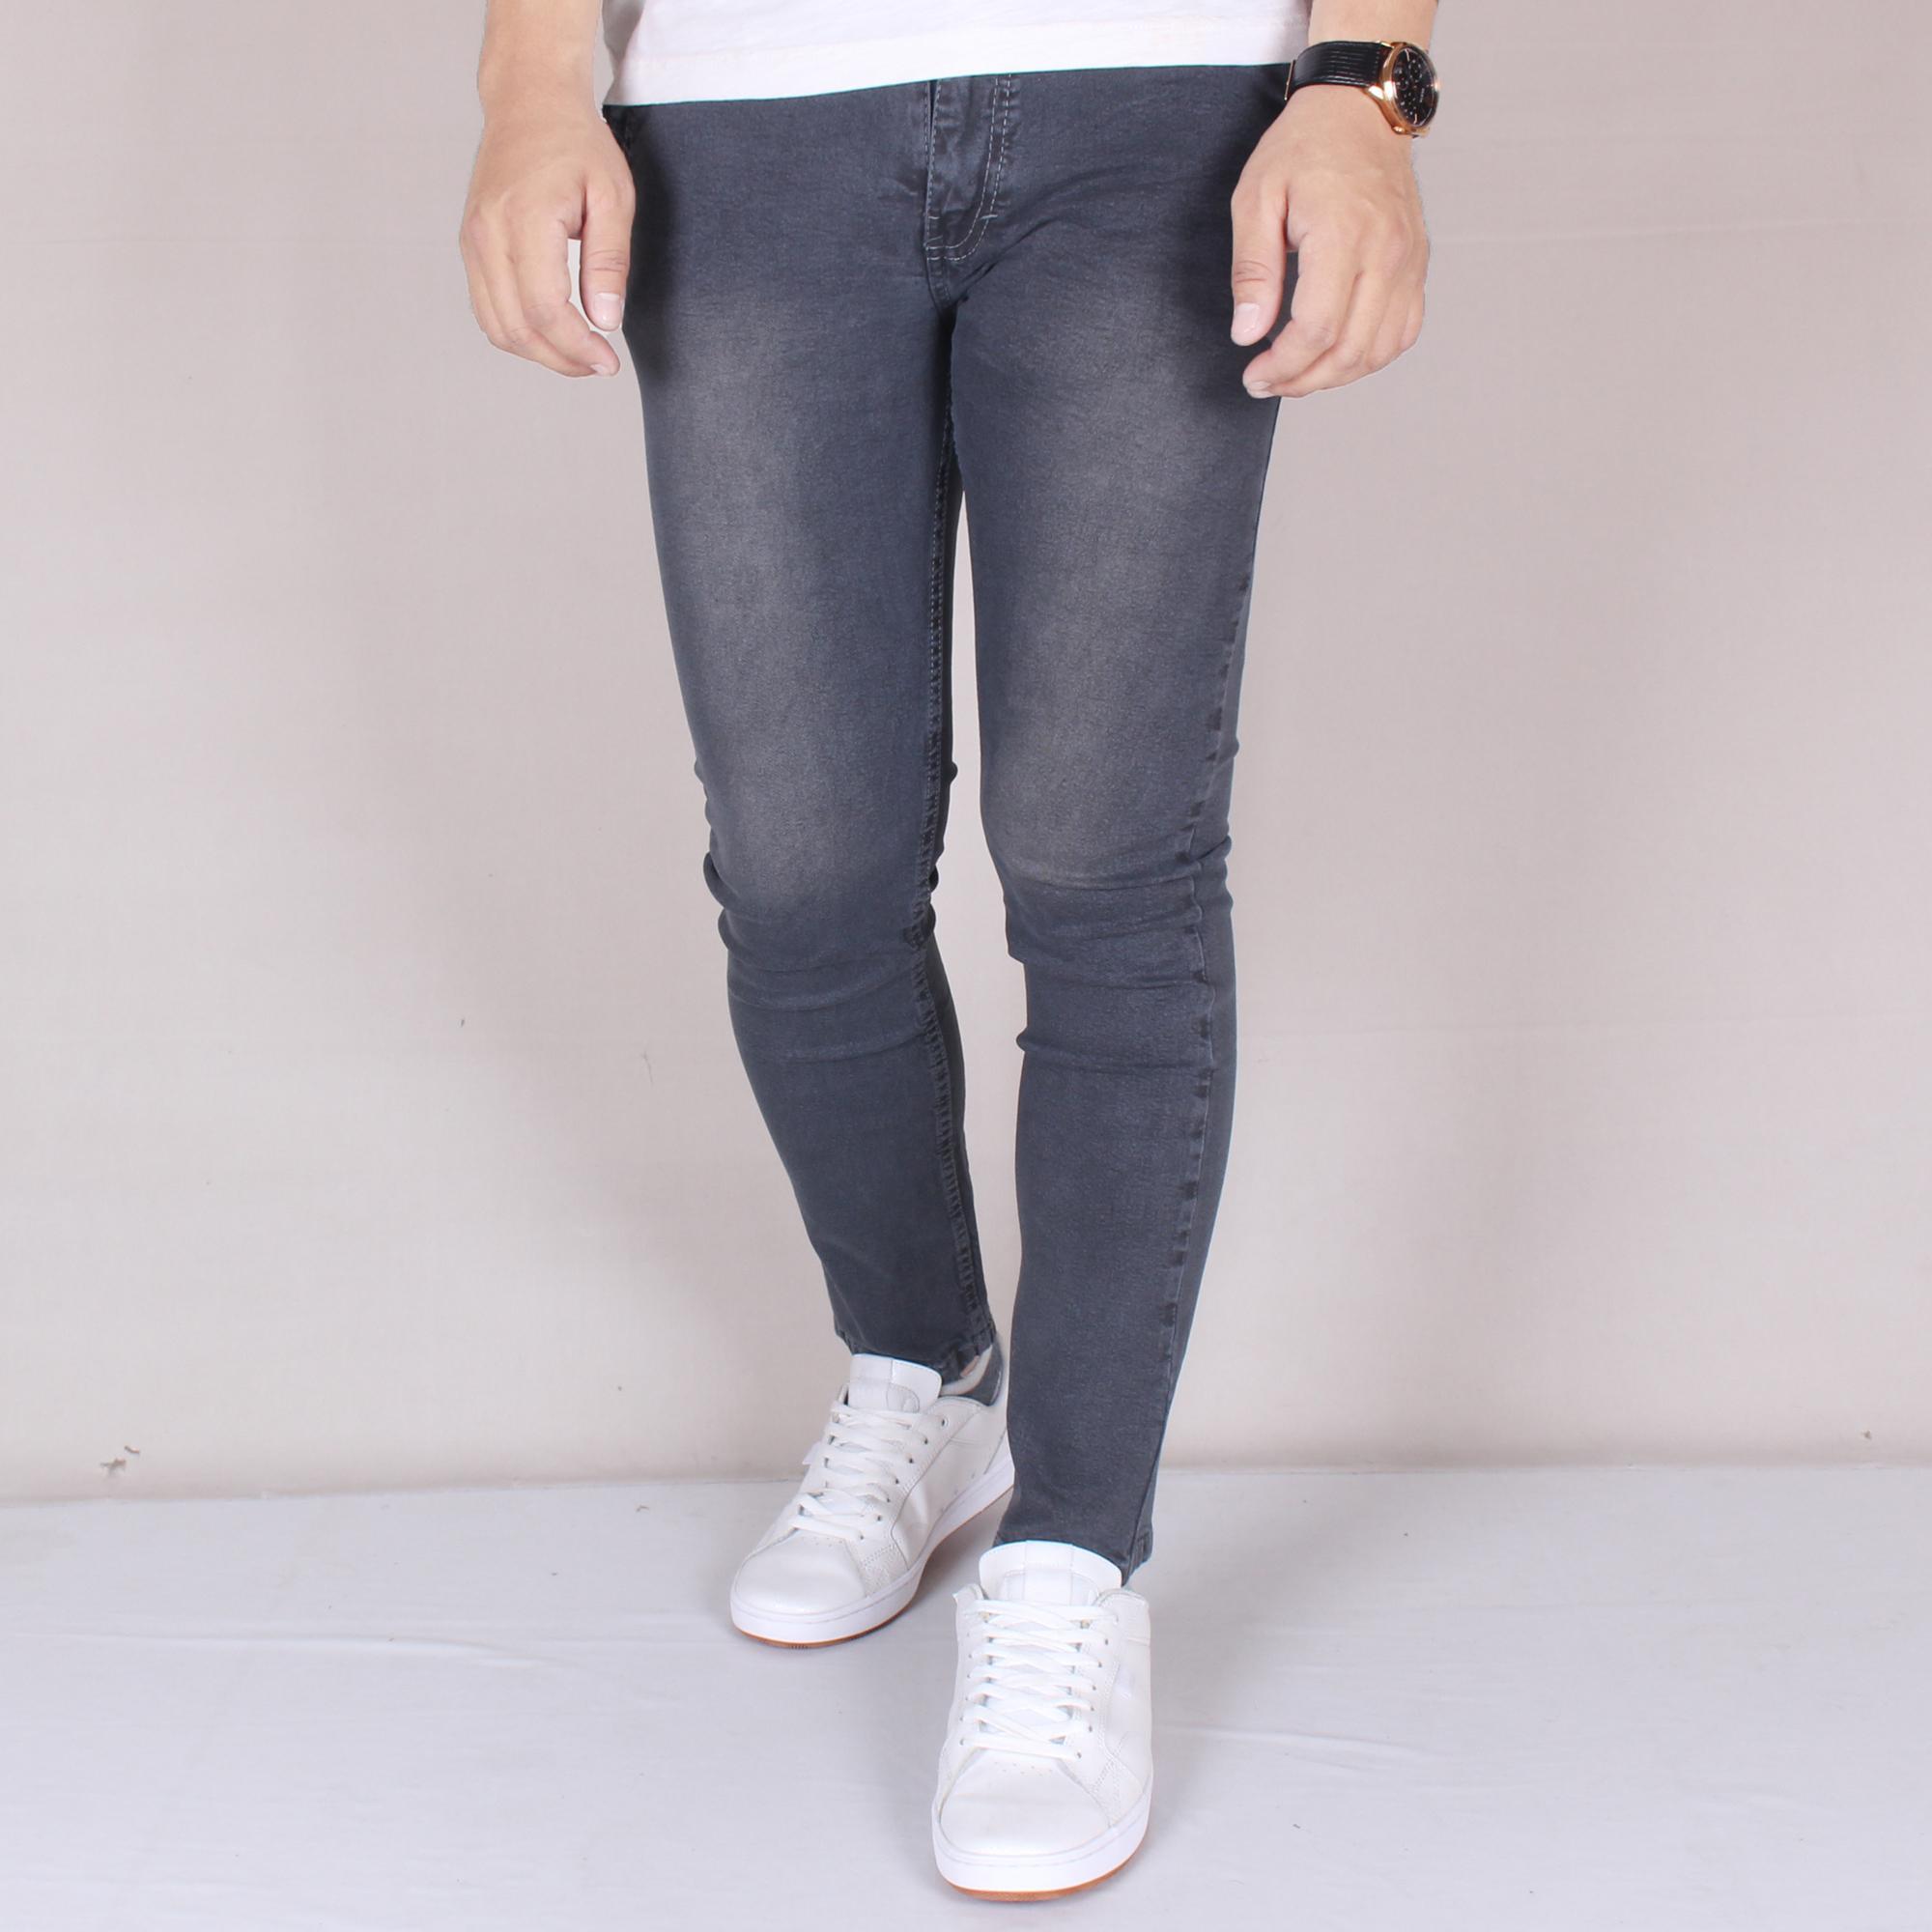 Zoeystore1 6010 Celena Jeans Panjang Pria Celana Jeans Skinny Cowok Skinny Jeans Gray Washing Simple Celana